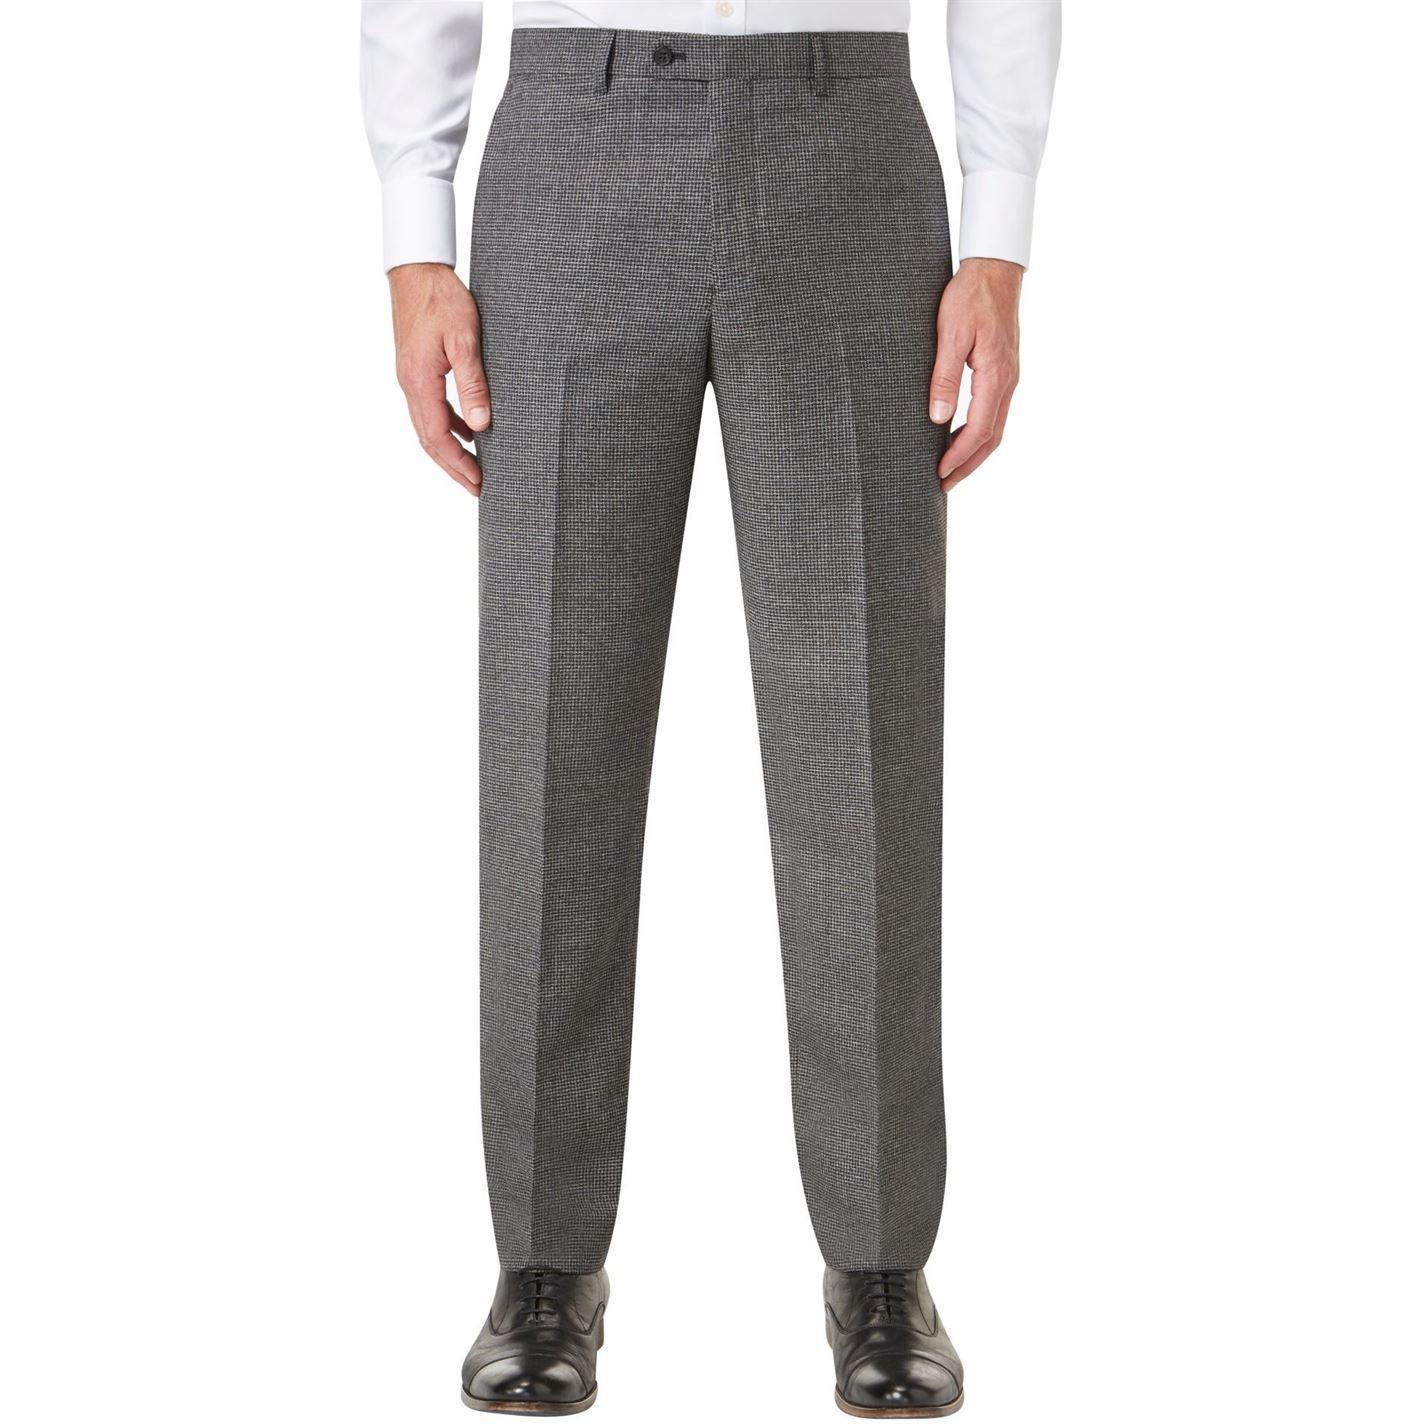 Skopes Braeaside Wool Blend Suit Trouser in Charcoal (Grey) for Men